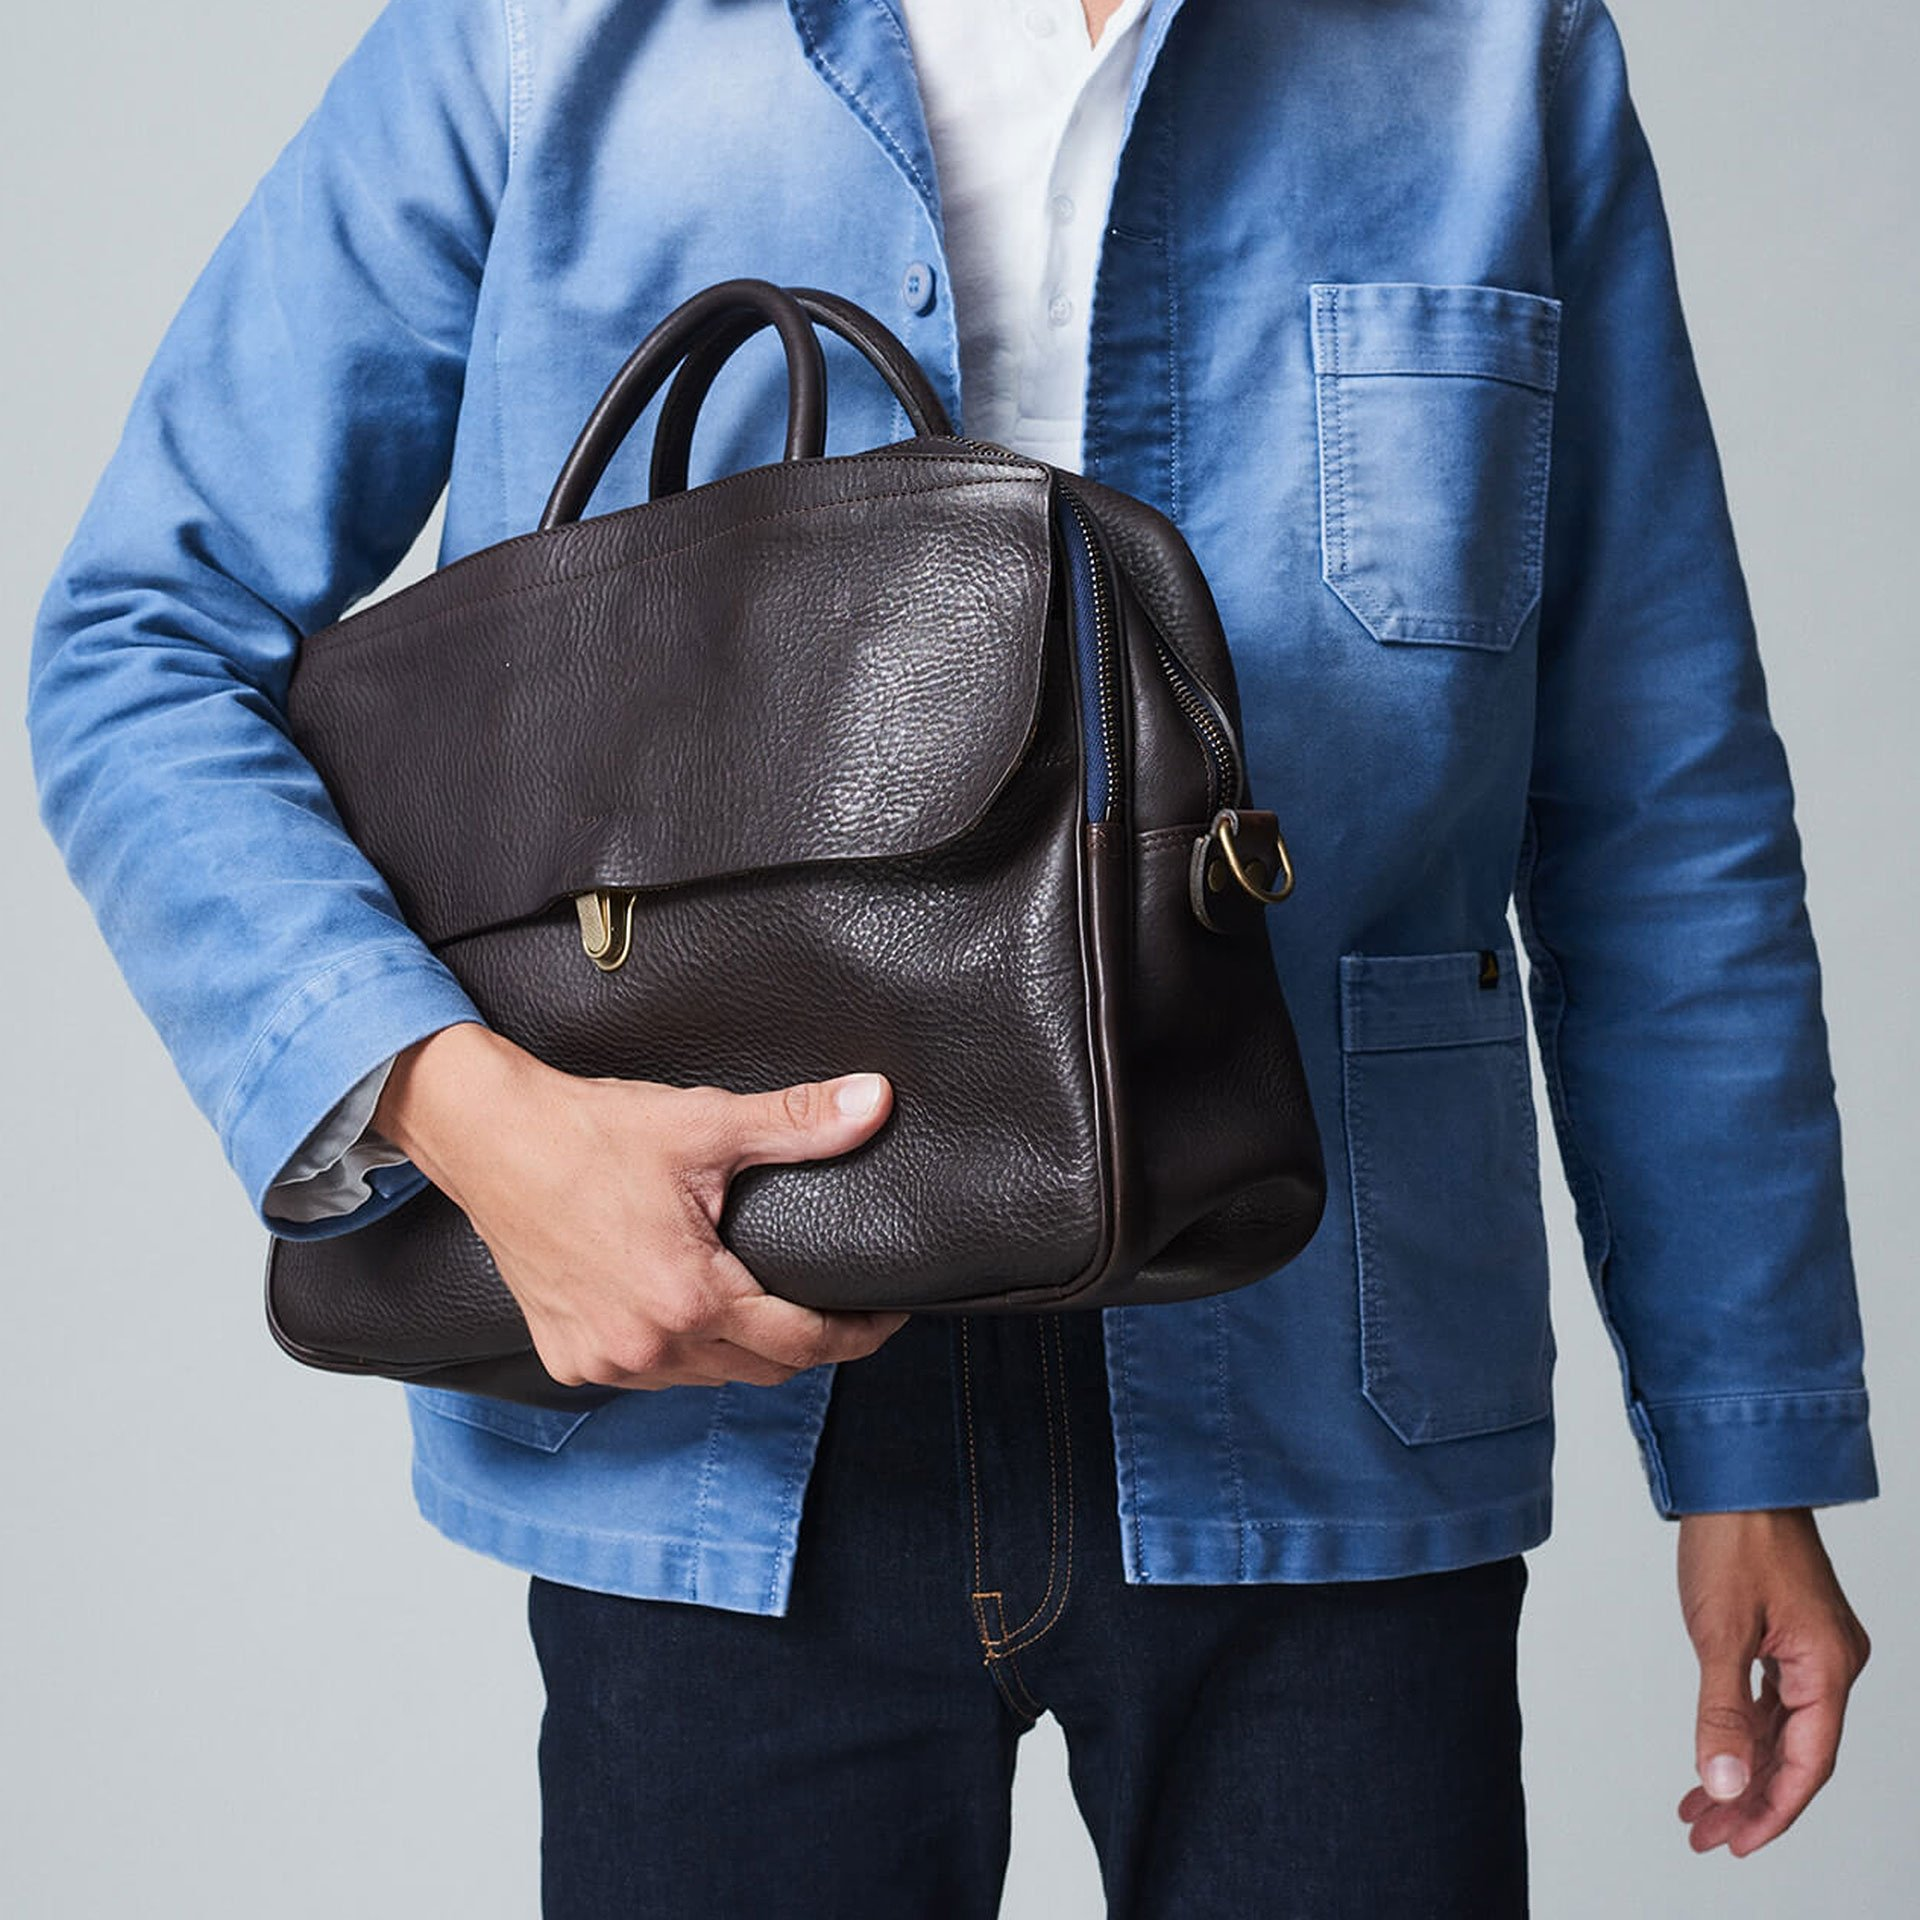 Zeppo Business bag - Dark Brown / E Pure (image n°7)